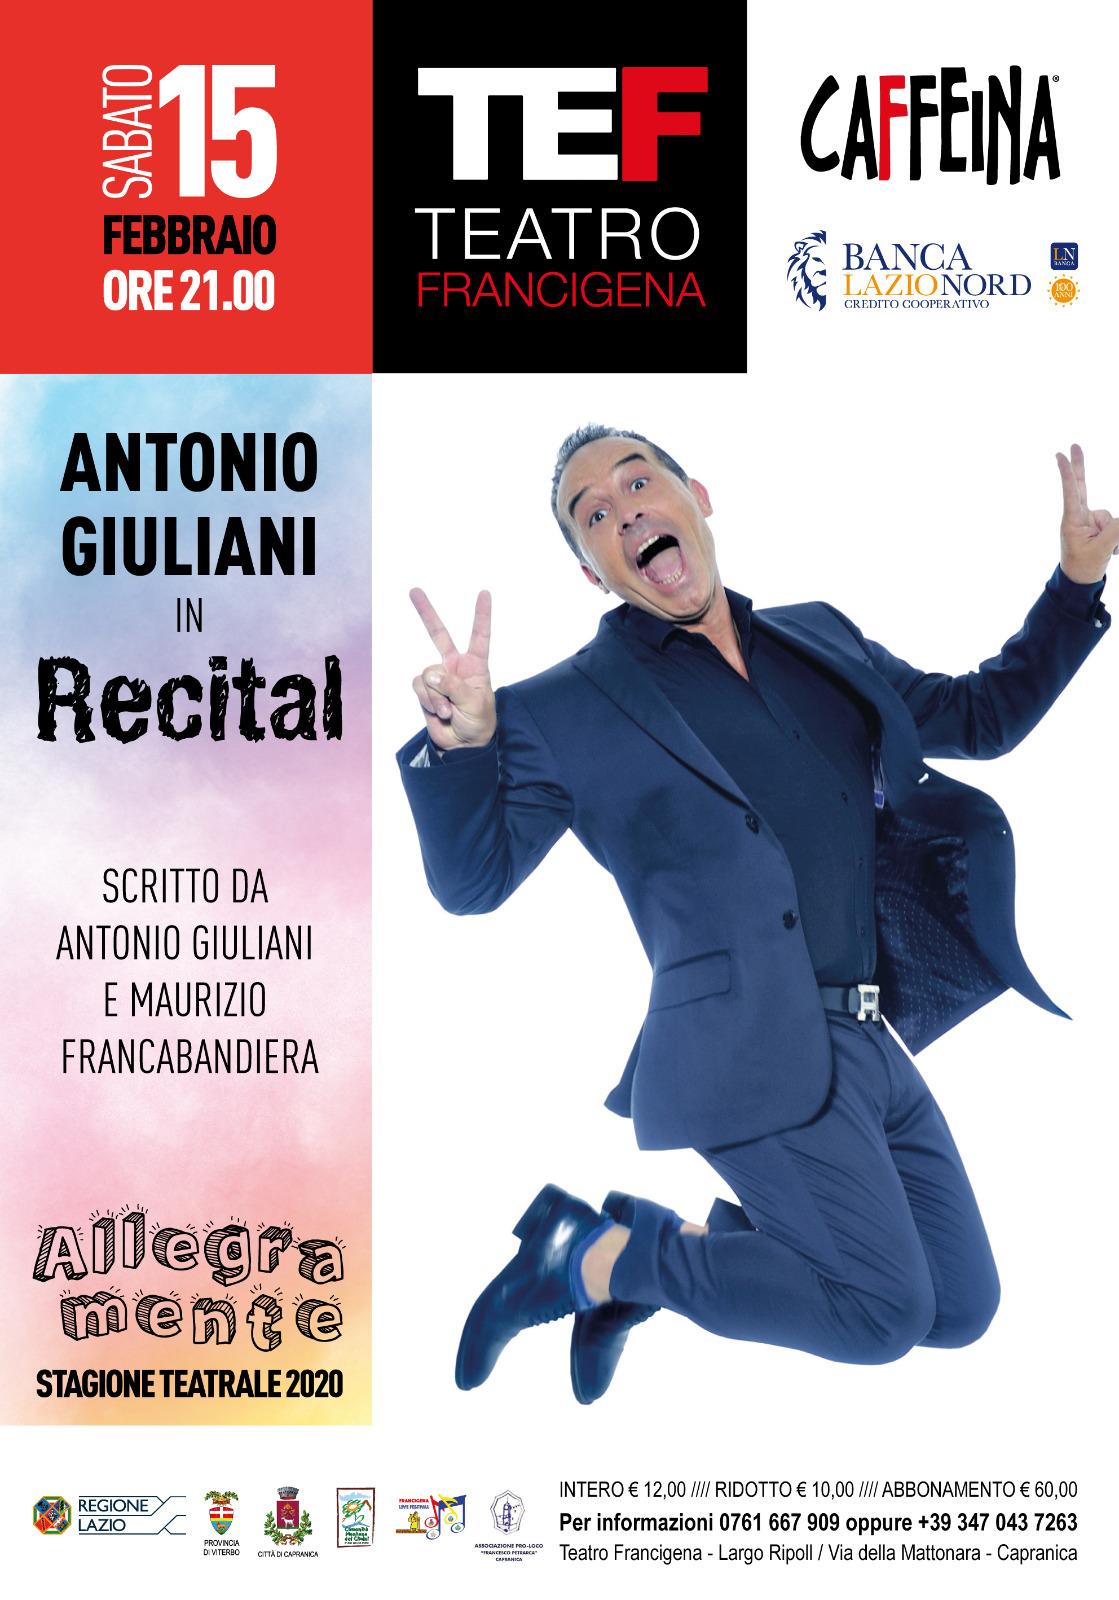 Capranica, Teatro, Antonio Giuliani al Teatro Francigena il 15 febbraio